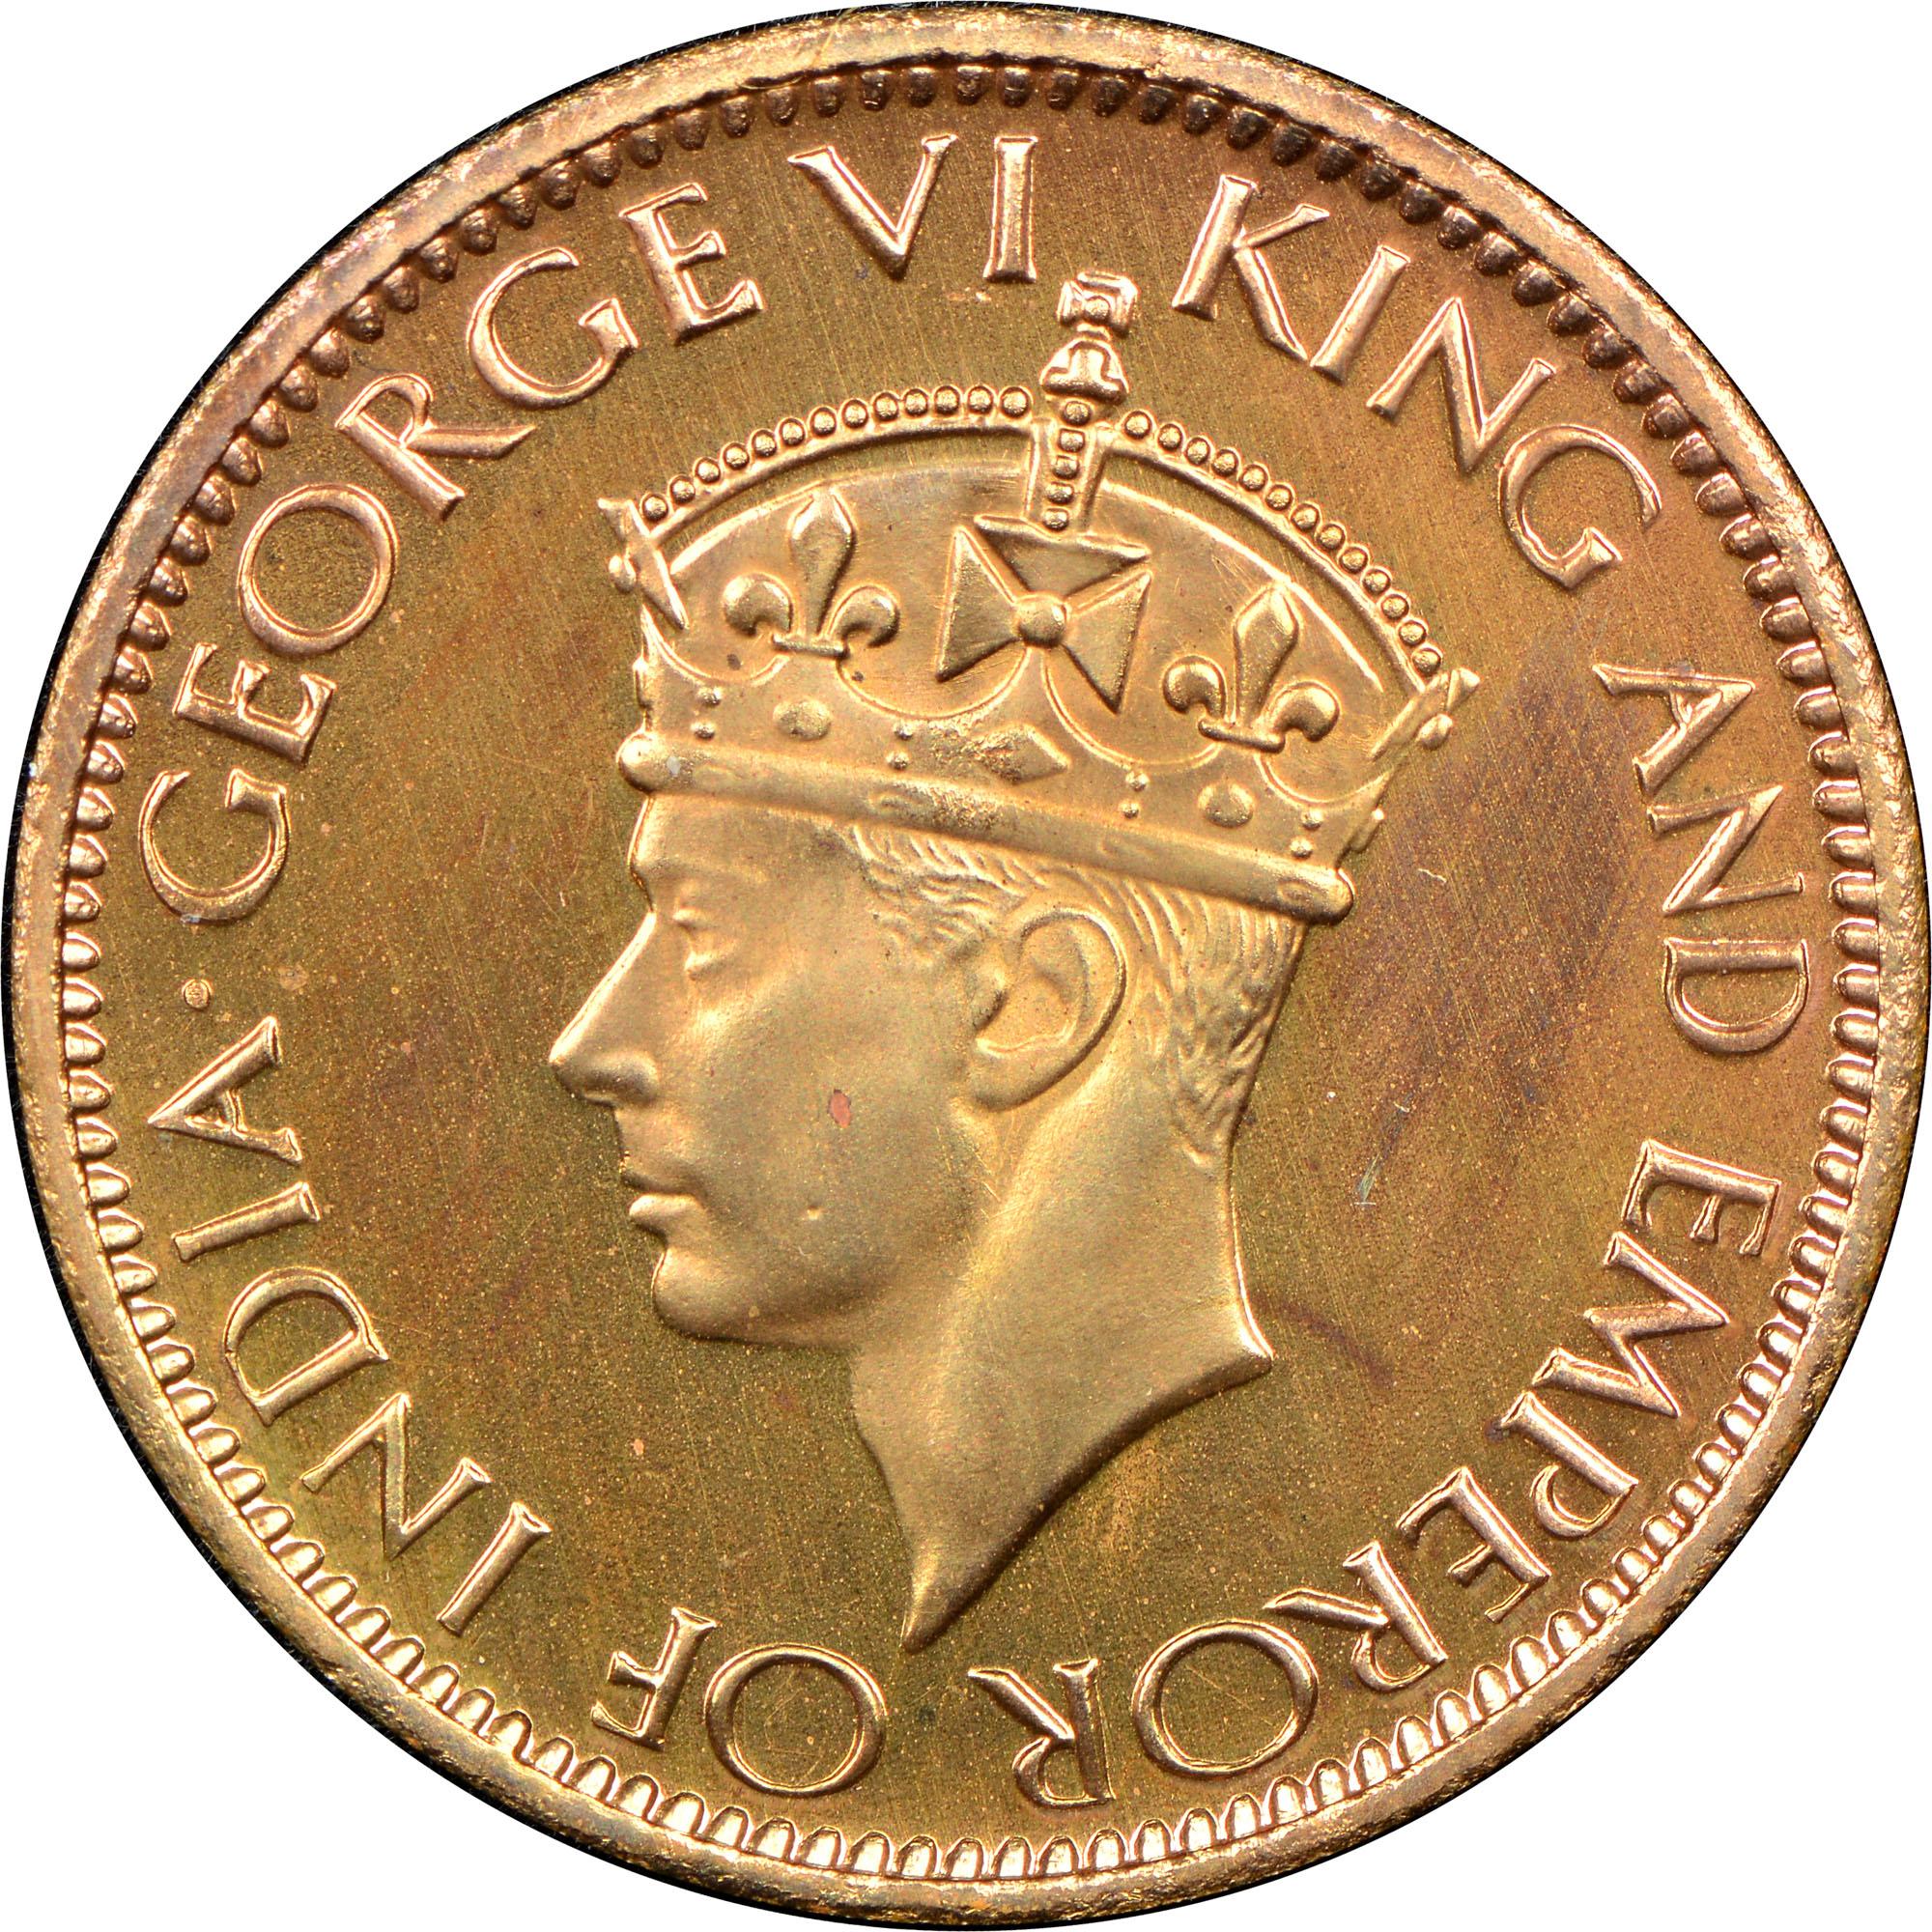 1942-1945 Ceylon Cent obverse